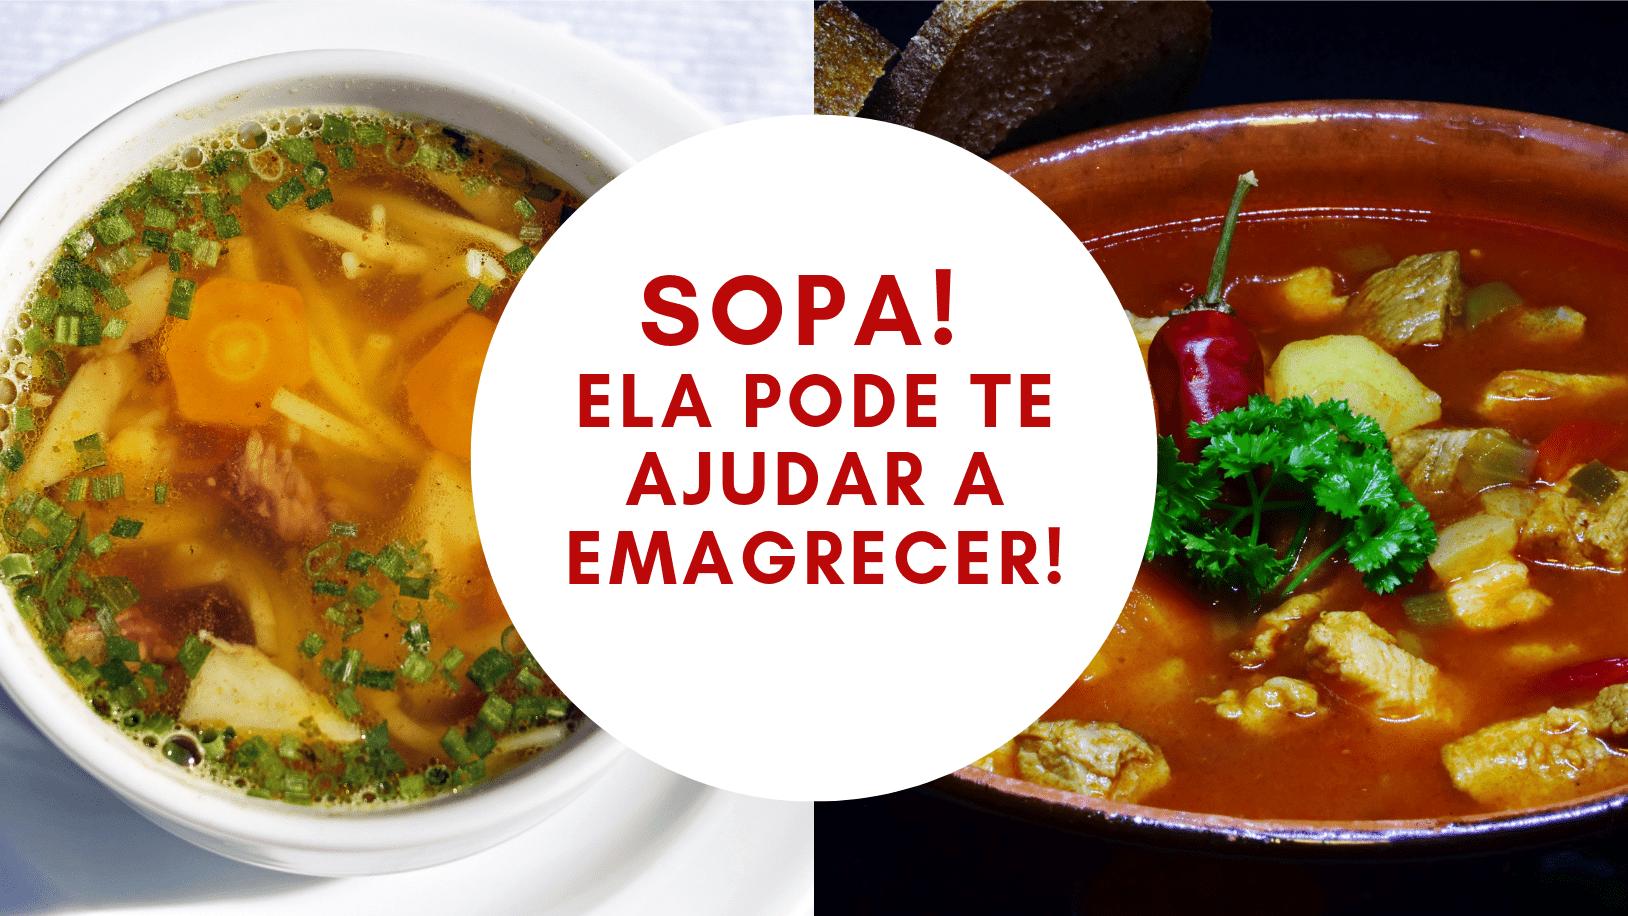 SOPA1